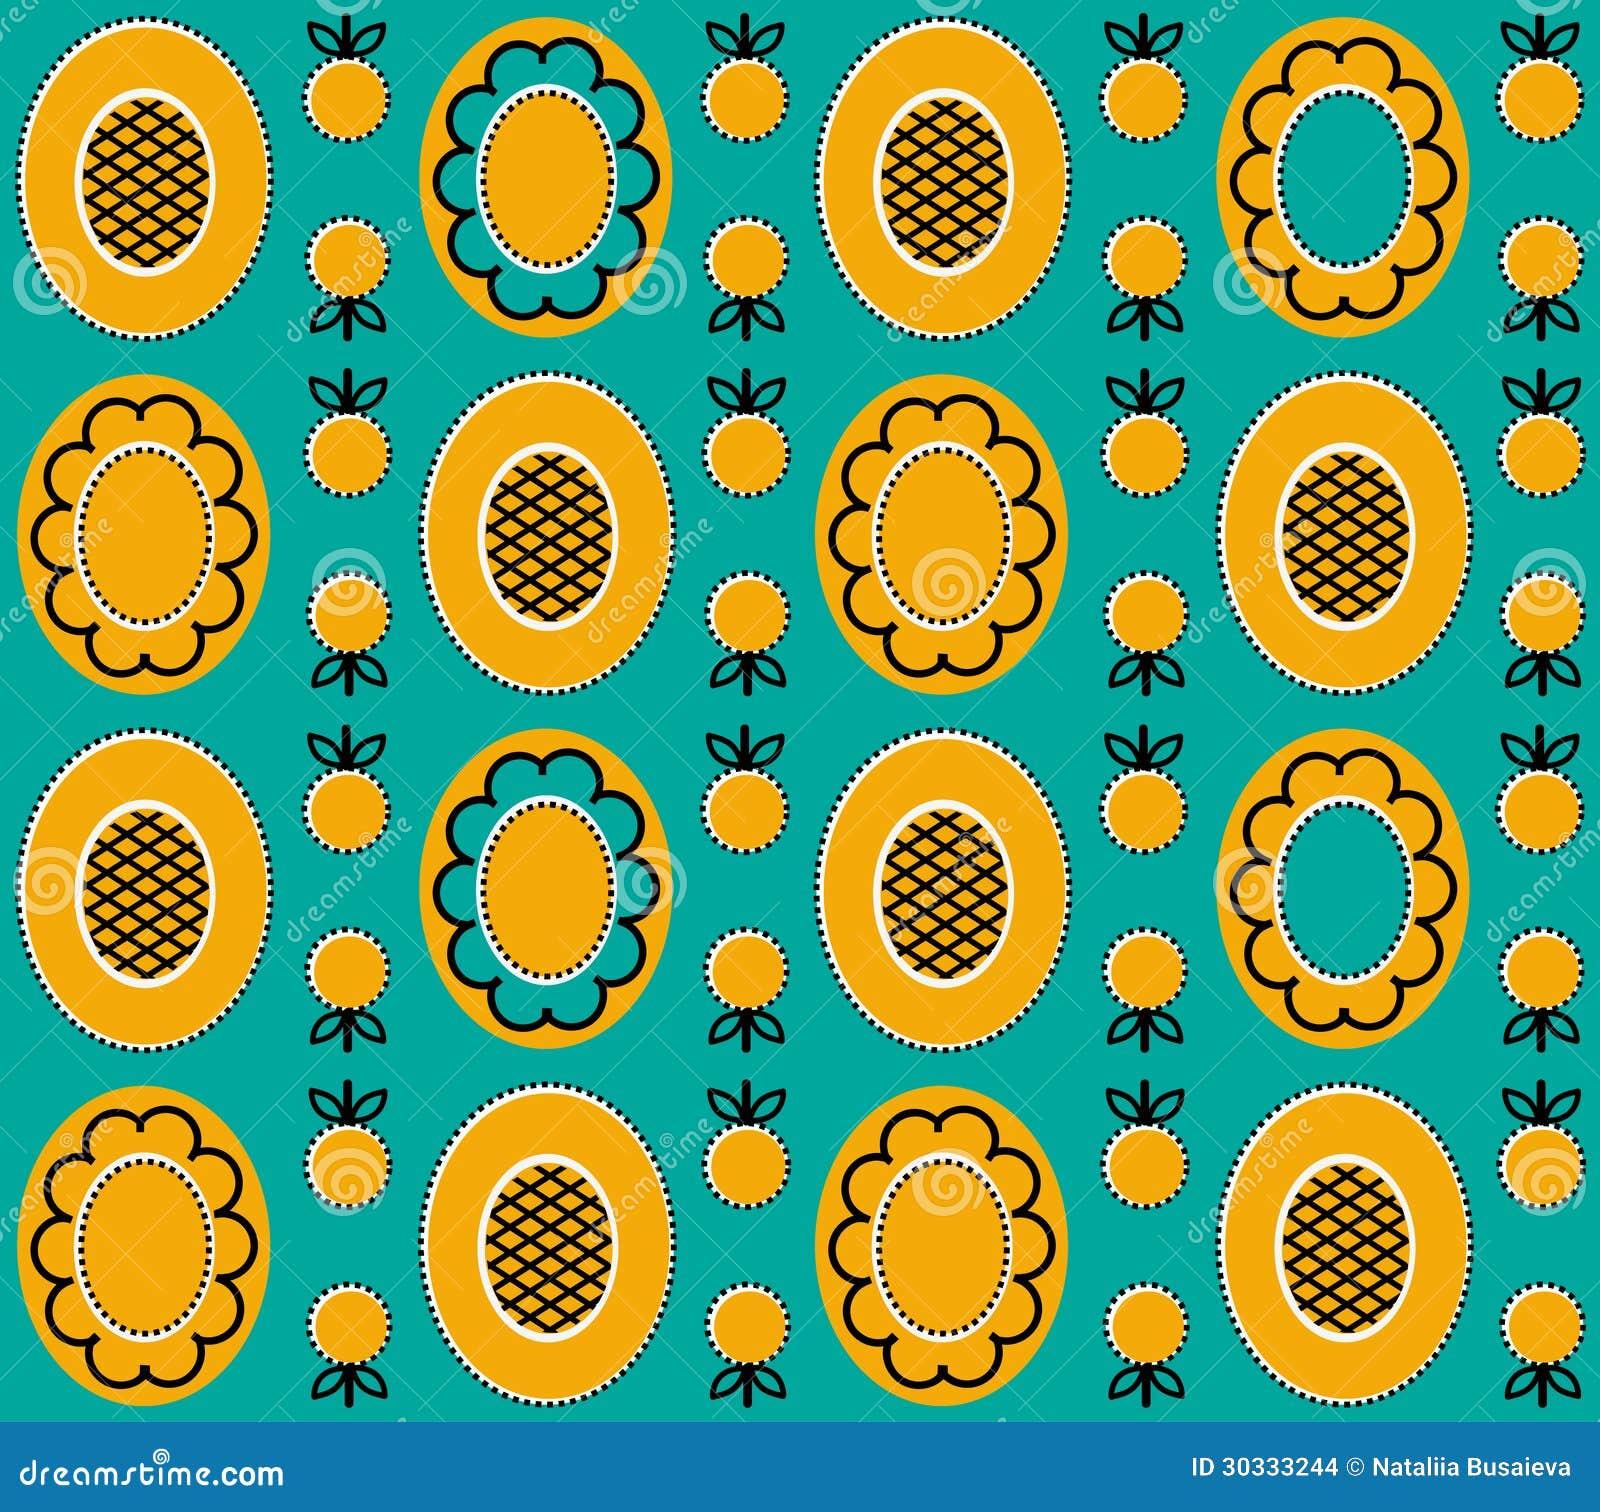 Yellow_background_2